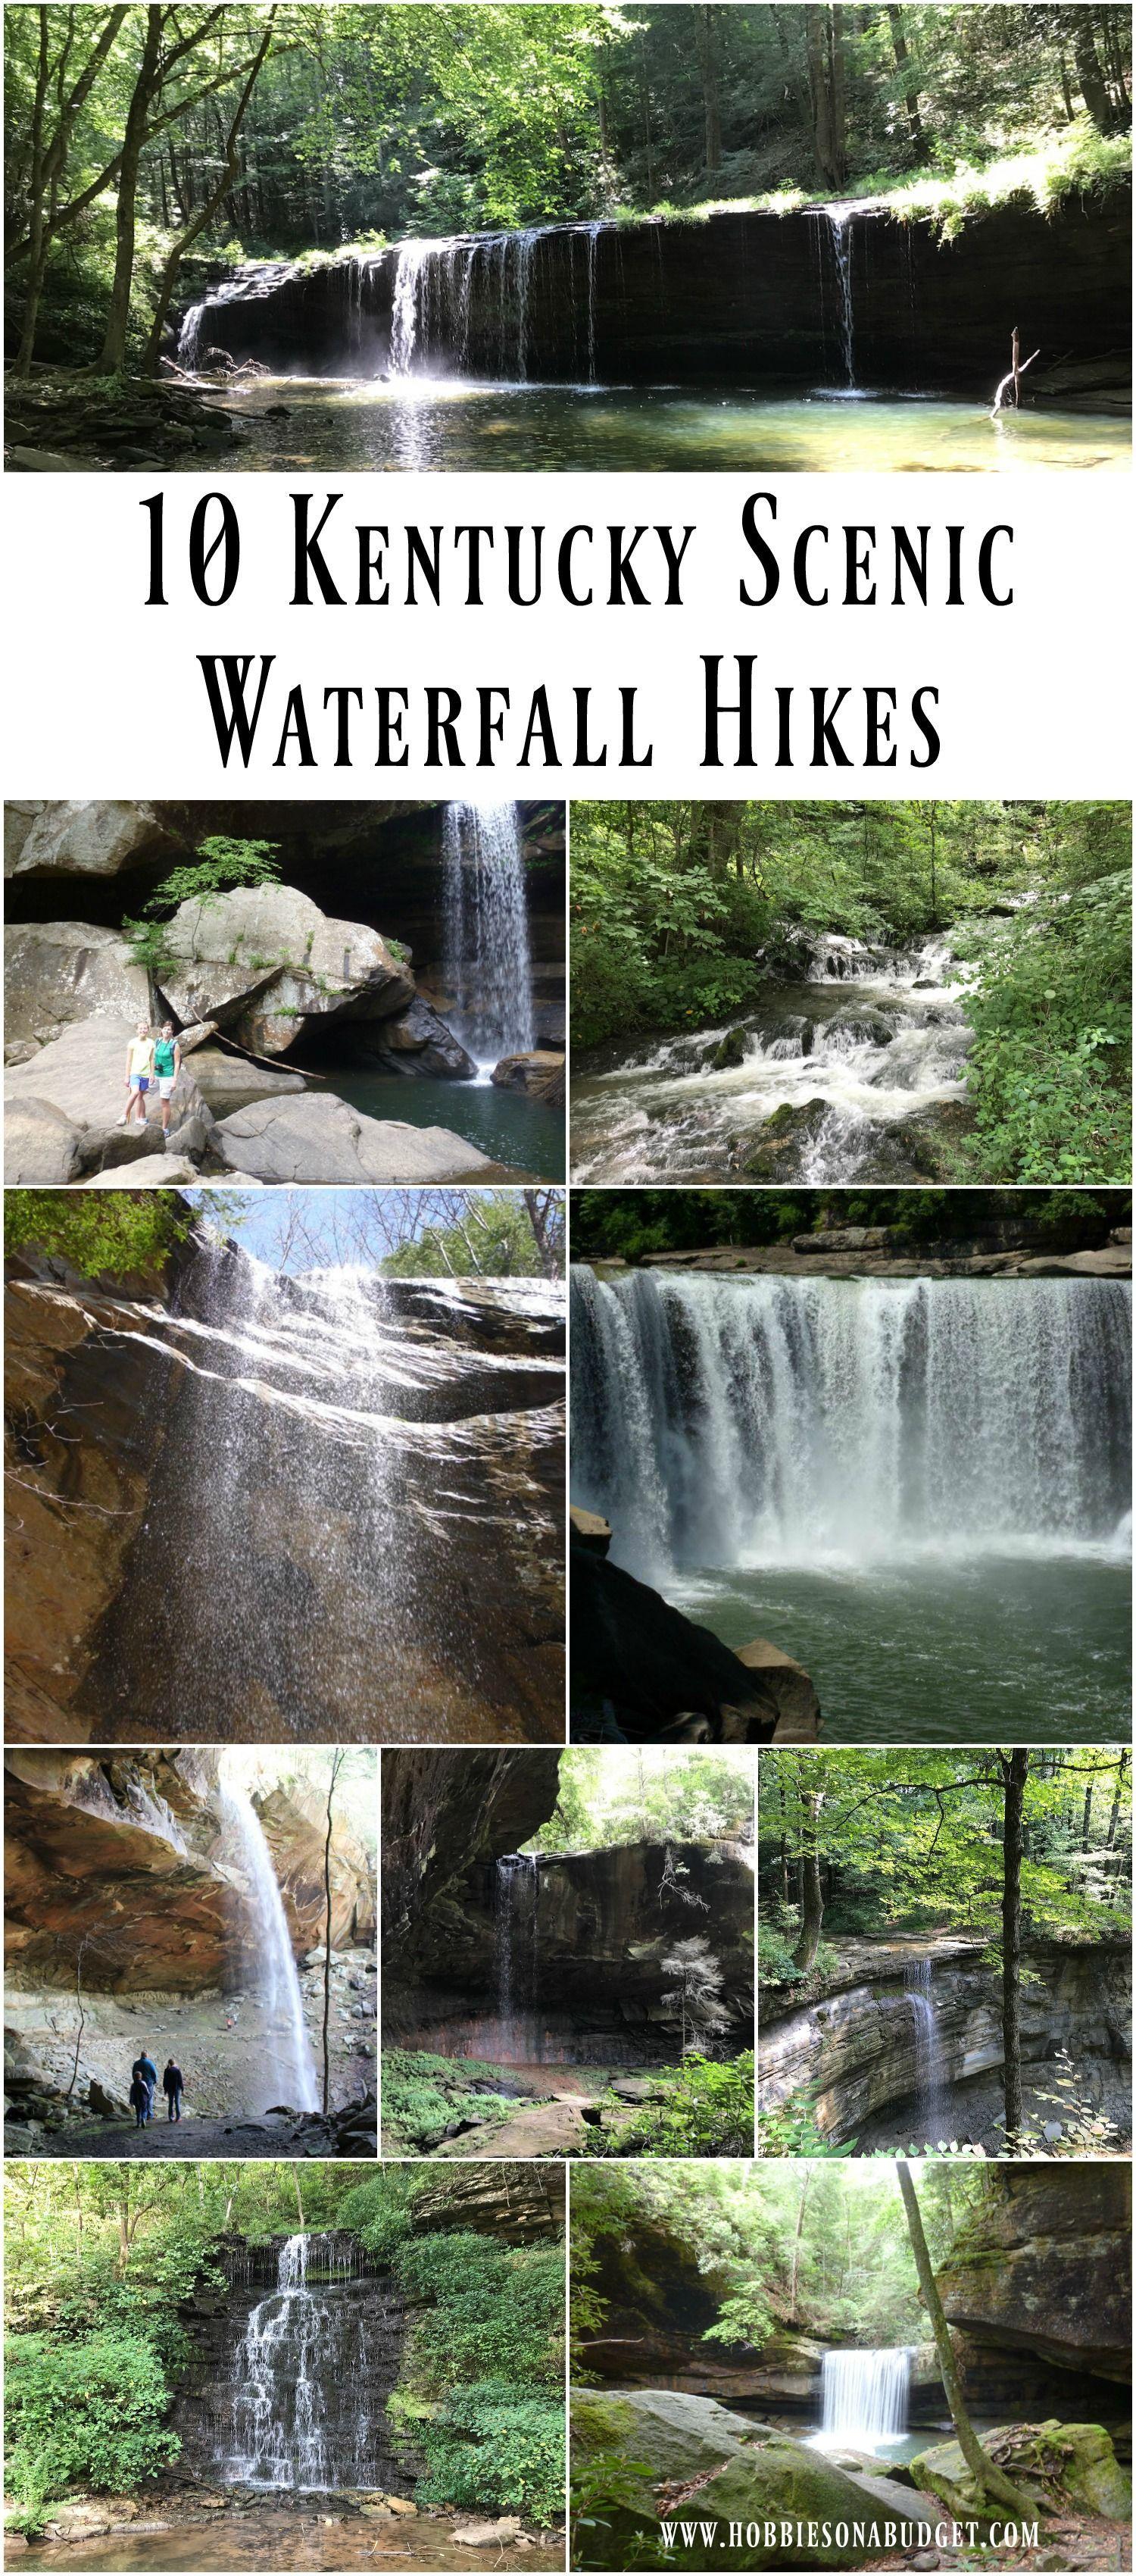 10 Kentucky Scenic Waterfall Hikes Kentucky Vacation Waterfall